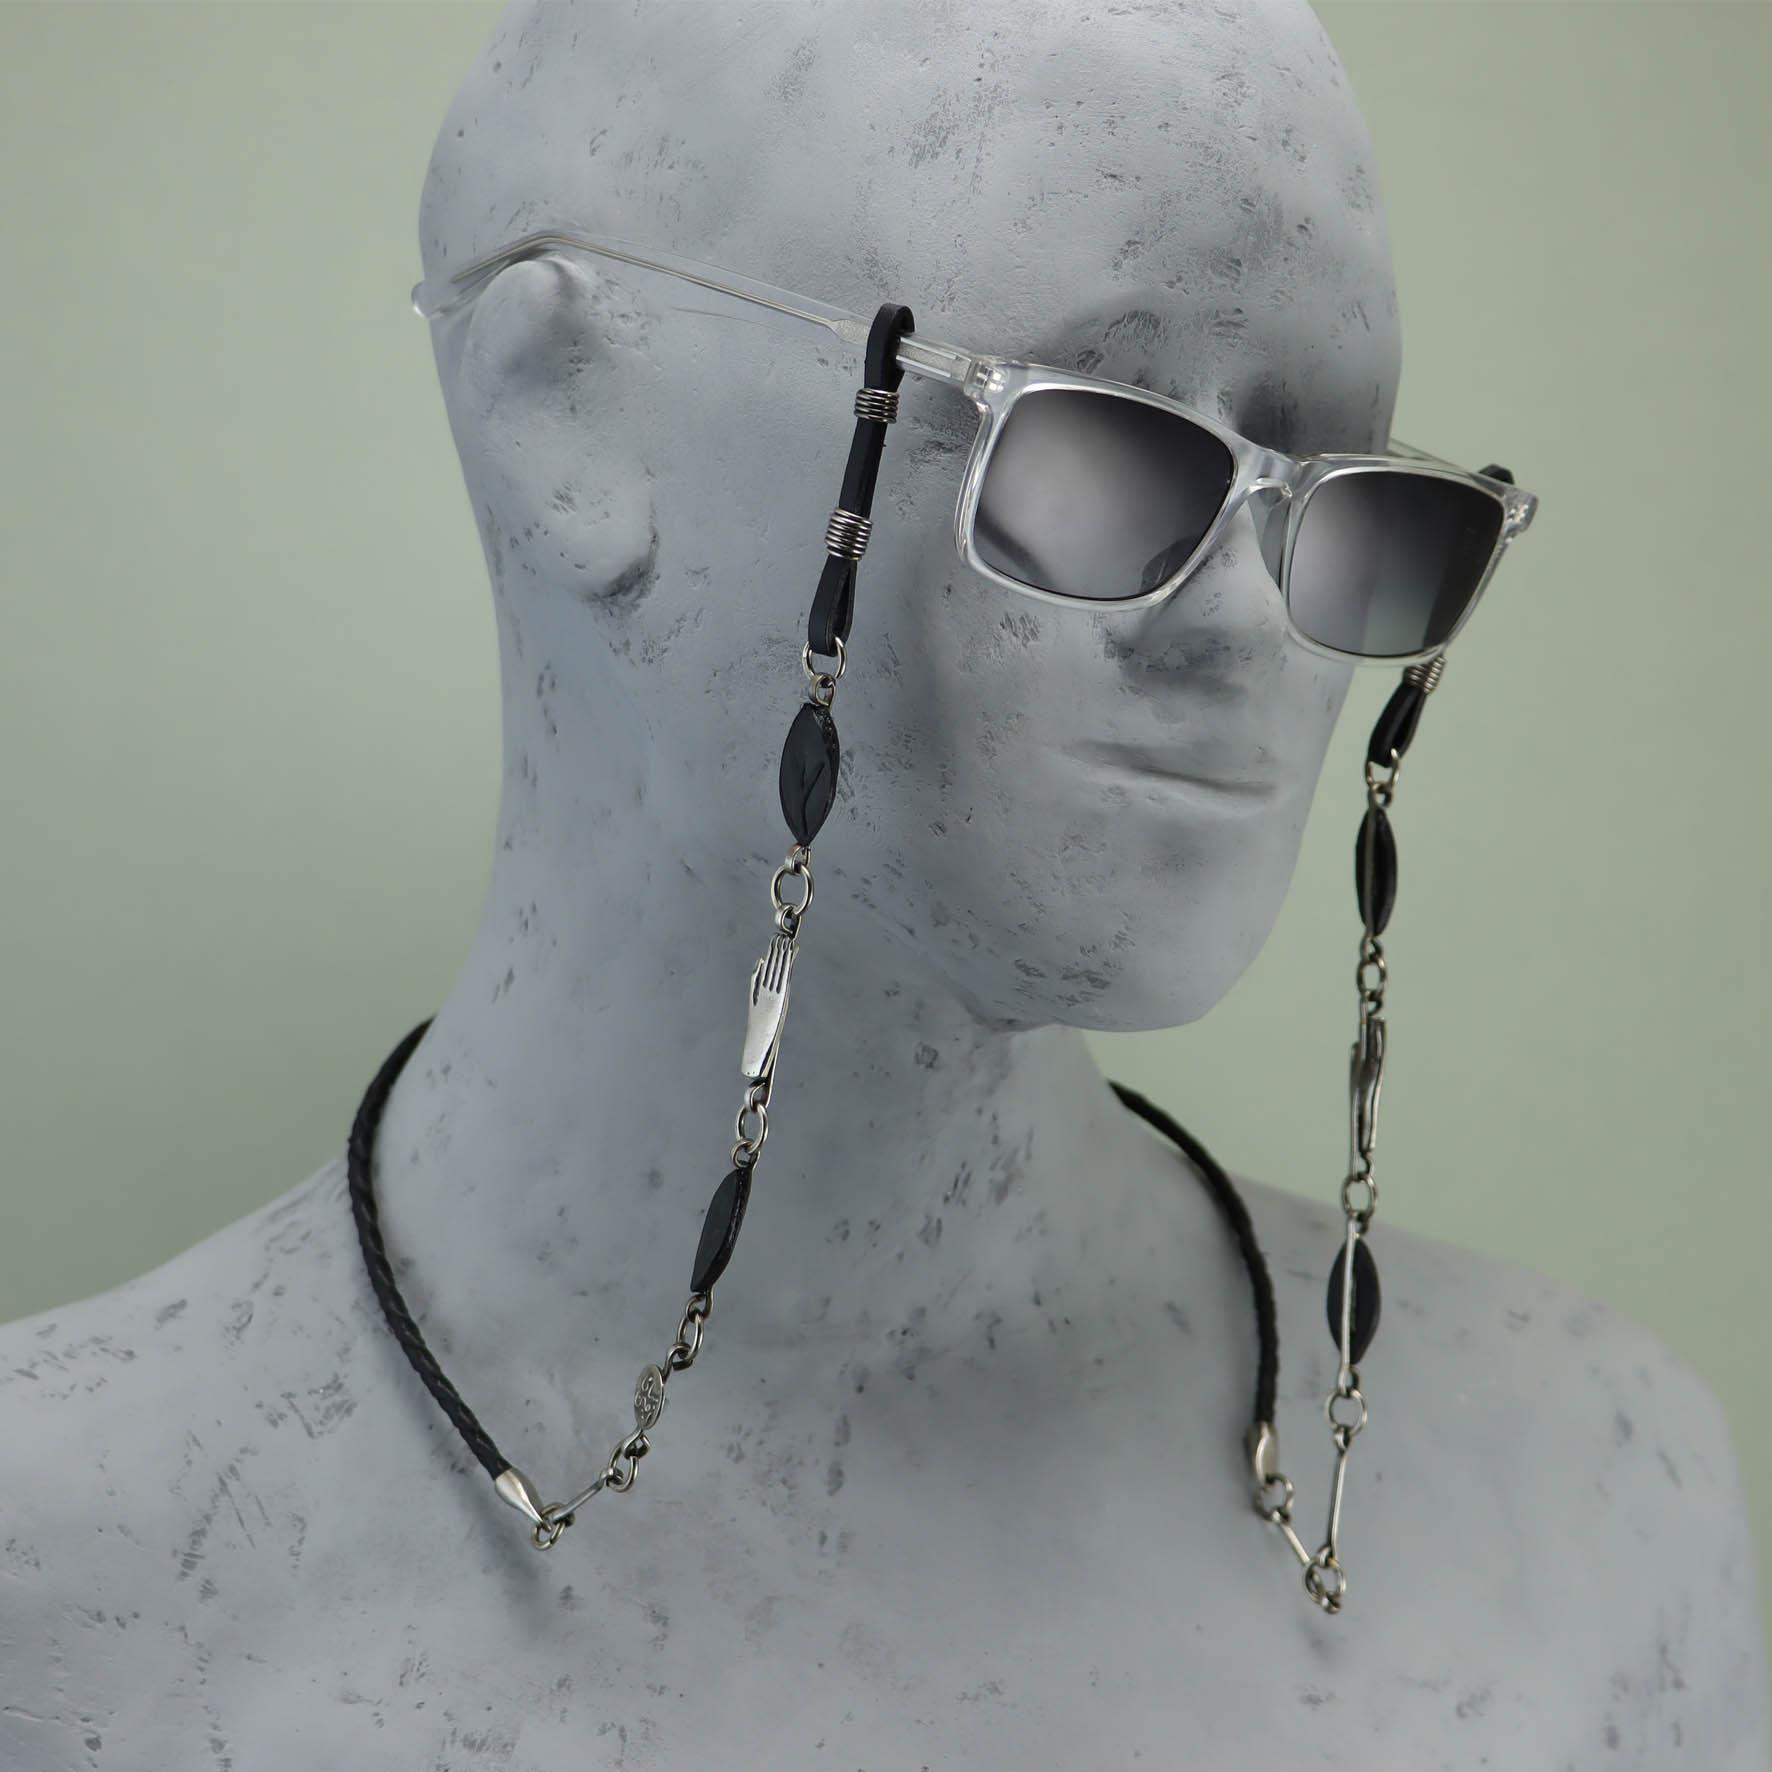 Pharaonic Hand glasses chain holder